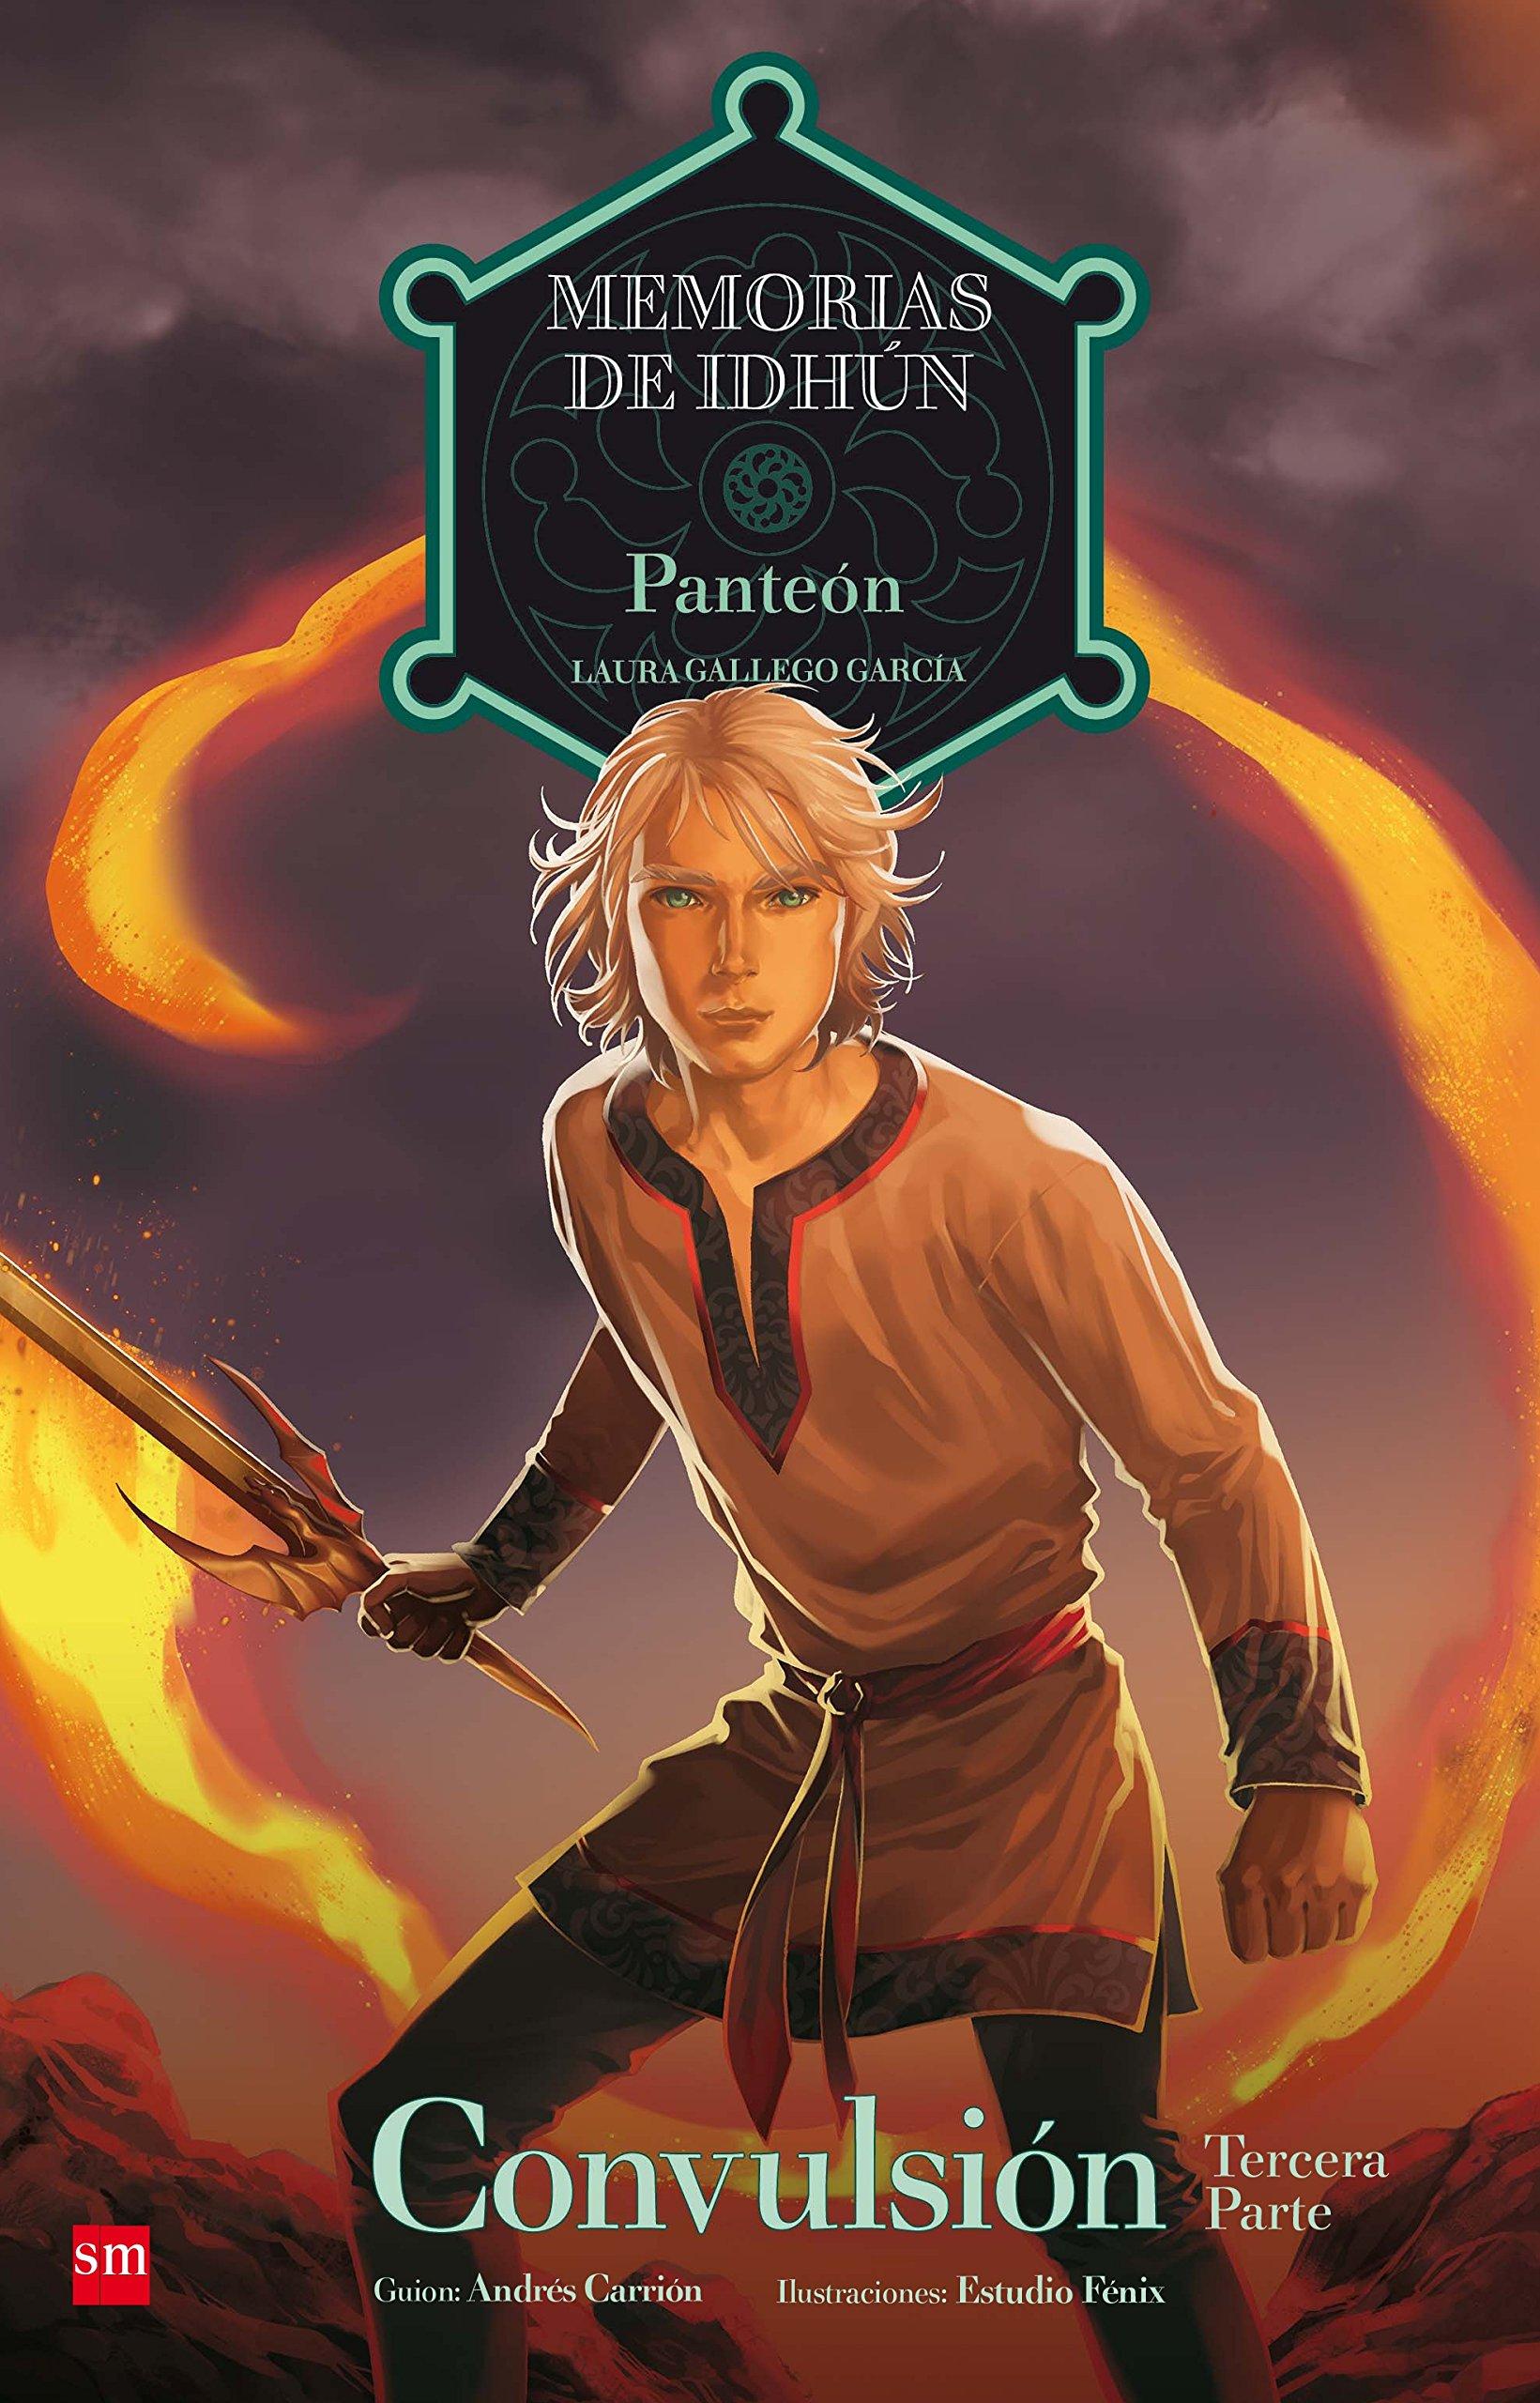 Memorias de Idhún: Panteón. Convulsión [3ª parte]. Cómic: 13